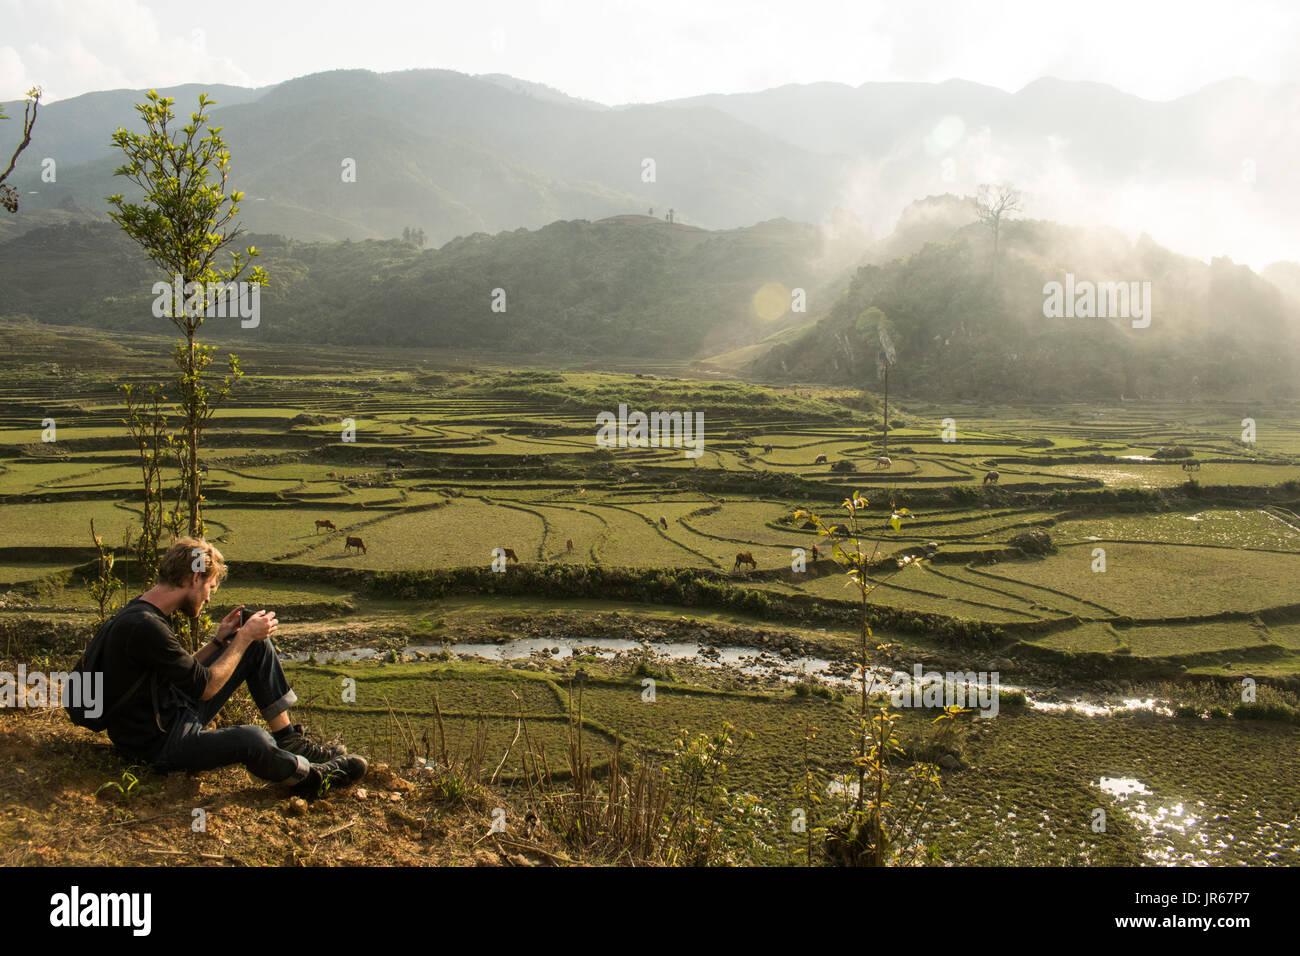 Sapa rice fields - Stock Image